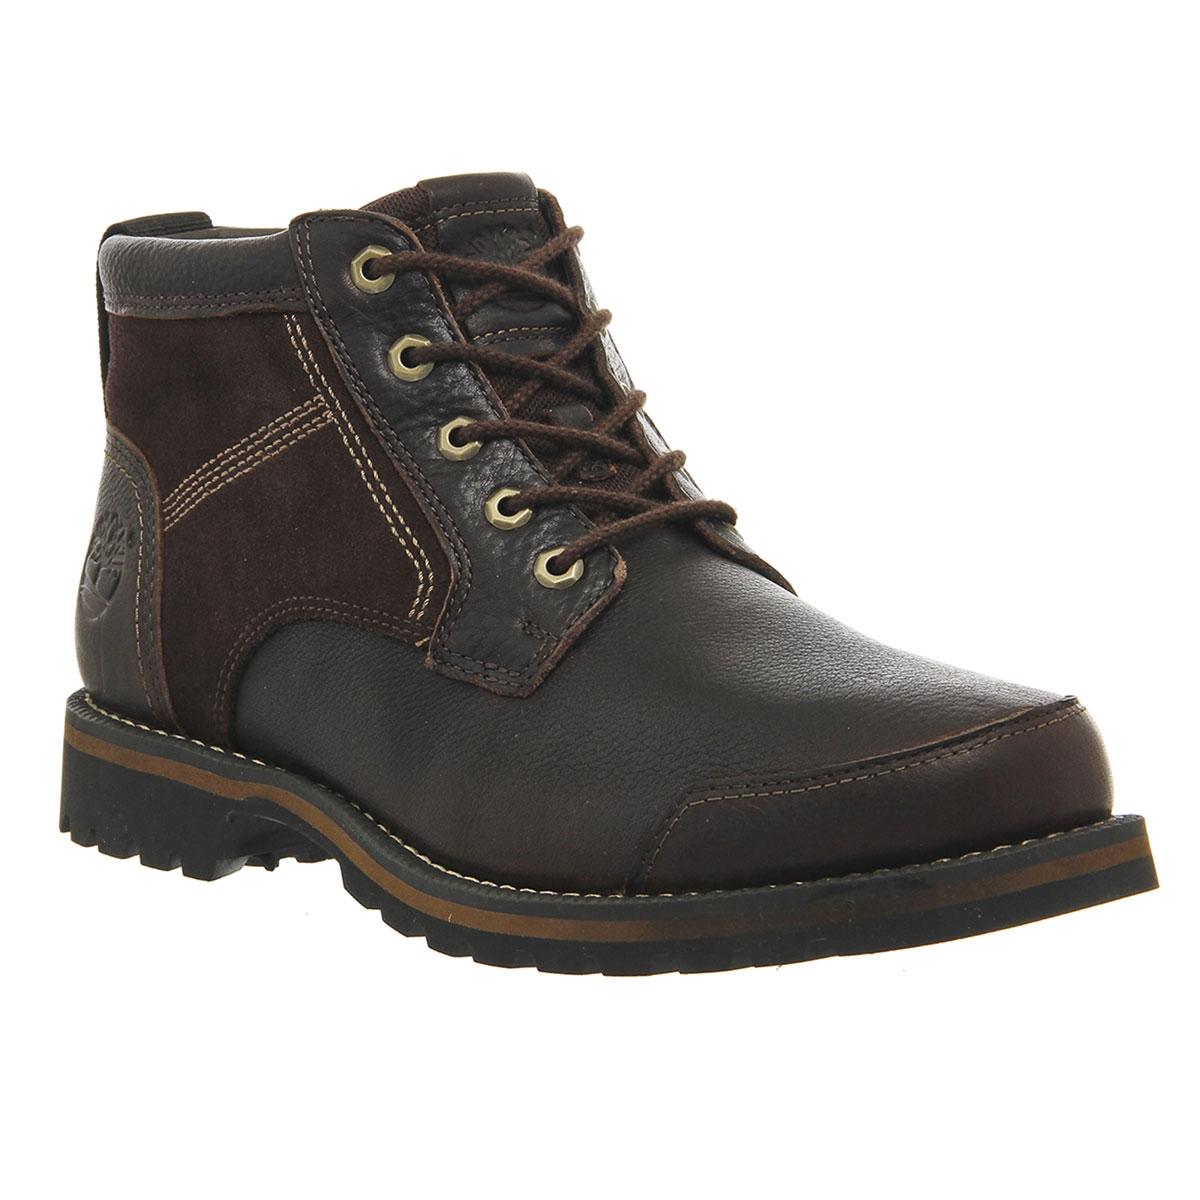 9526e83d44f Timberland Earthkeepers Larchmont Chukka Boots (Men's) - Gaucho Saddleback  (Dark Brown) Full Grain